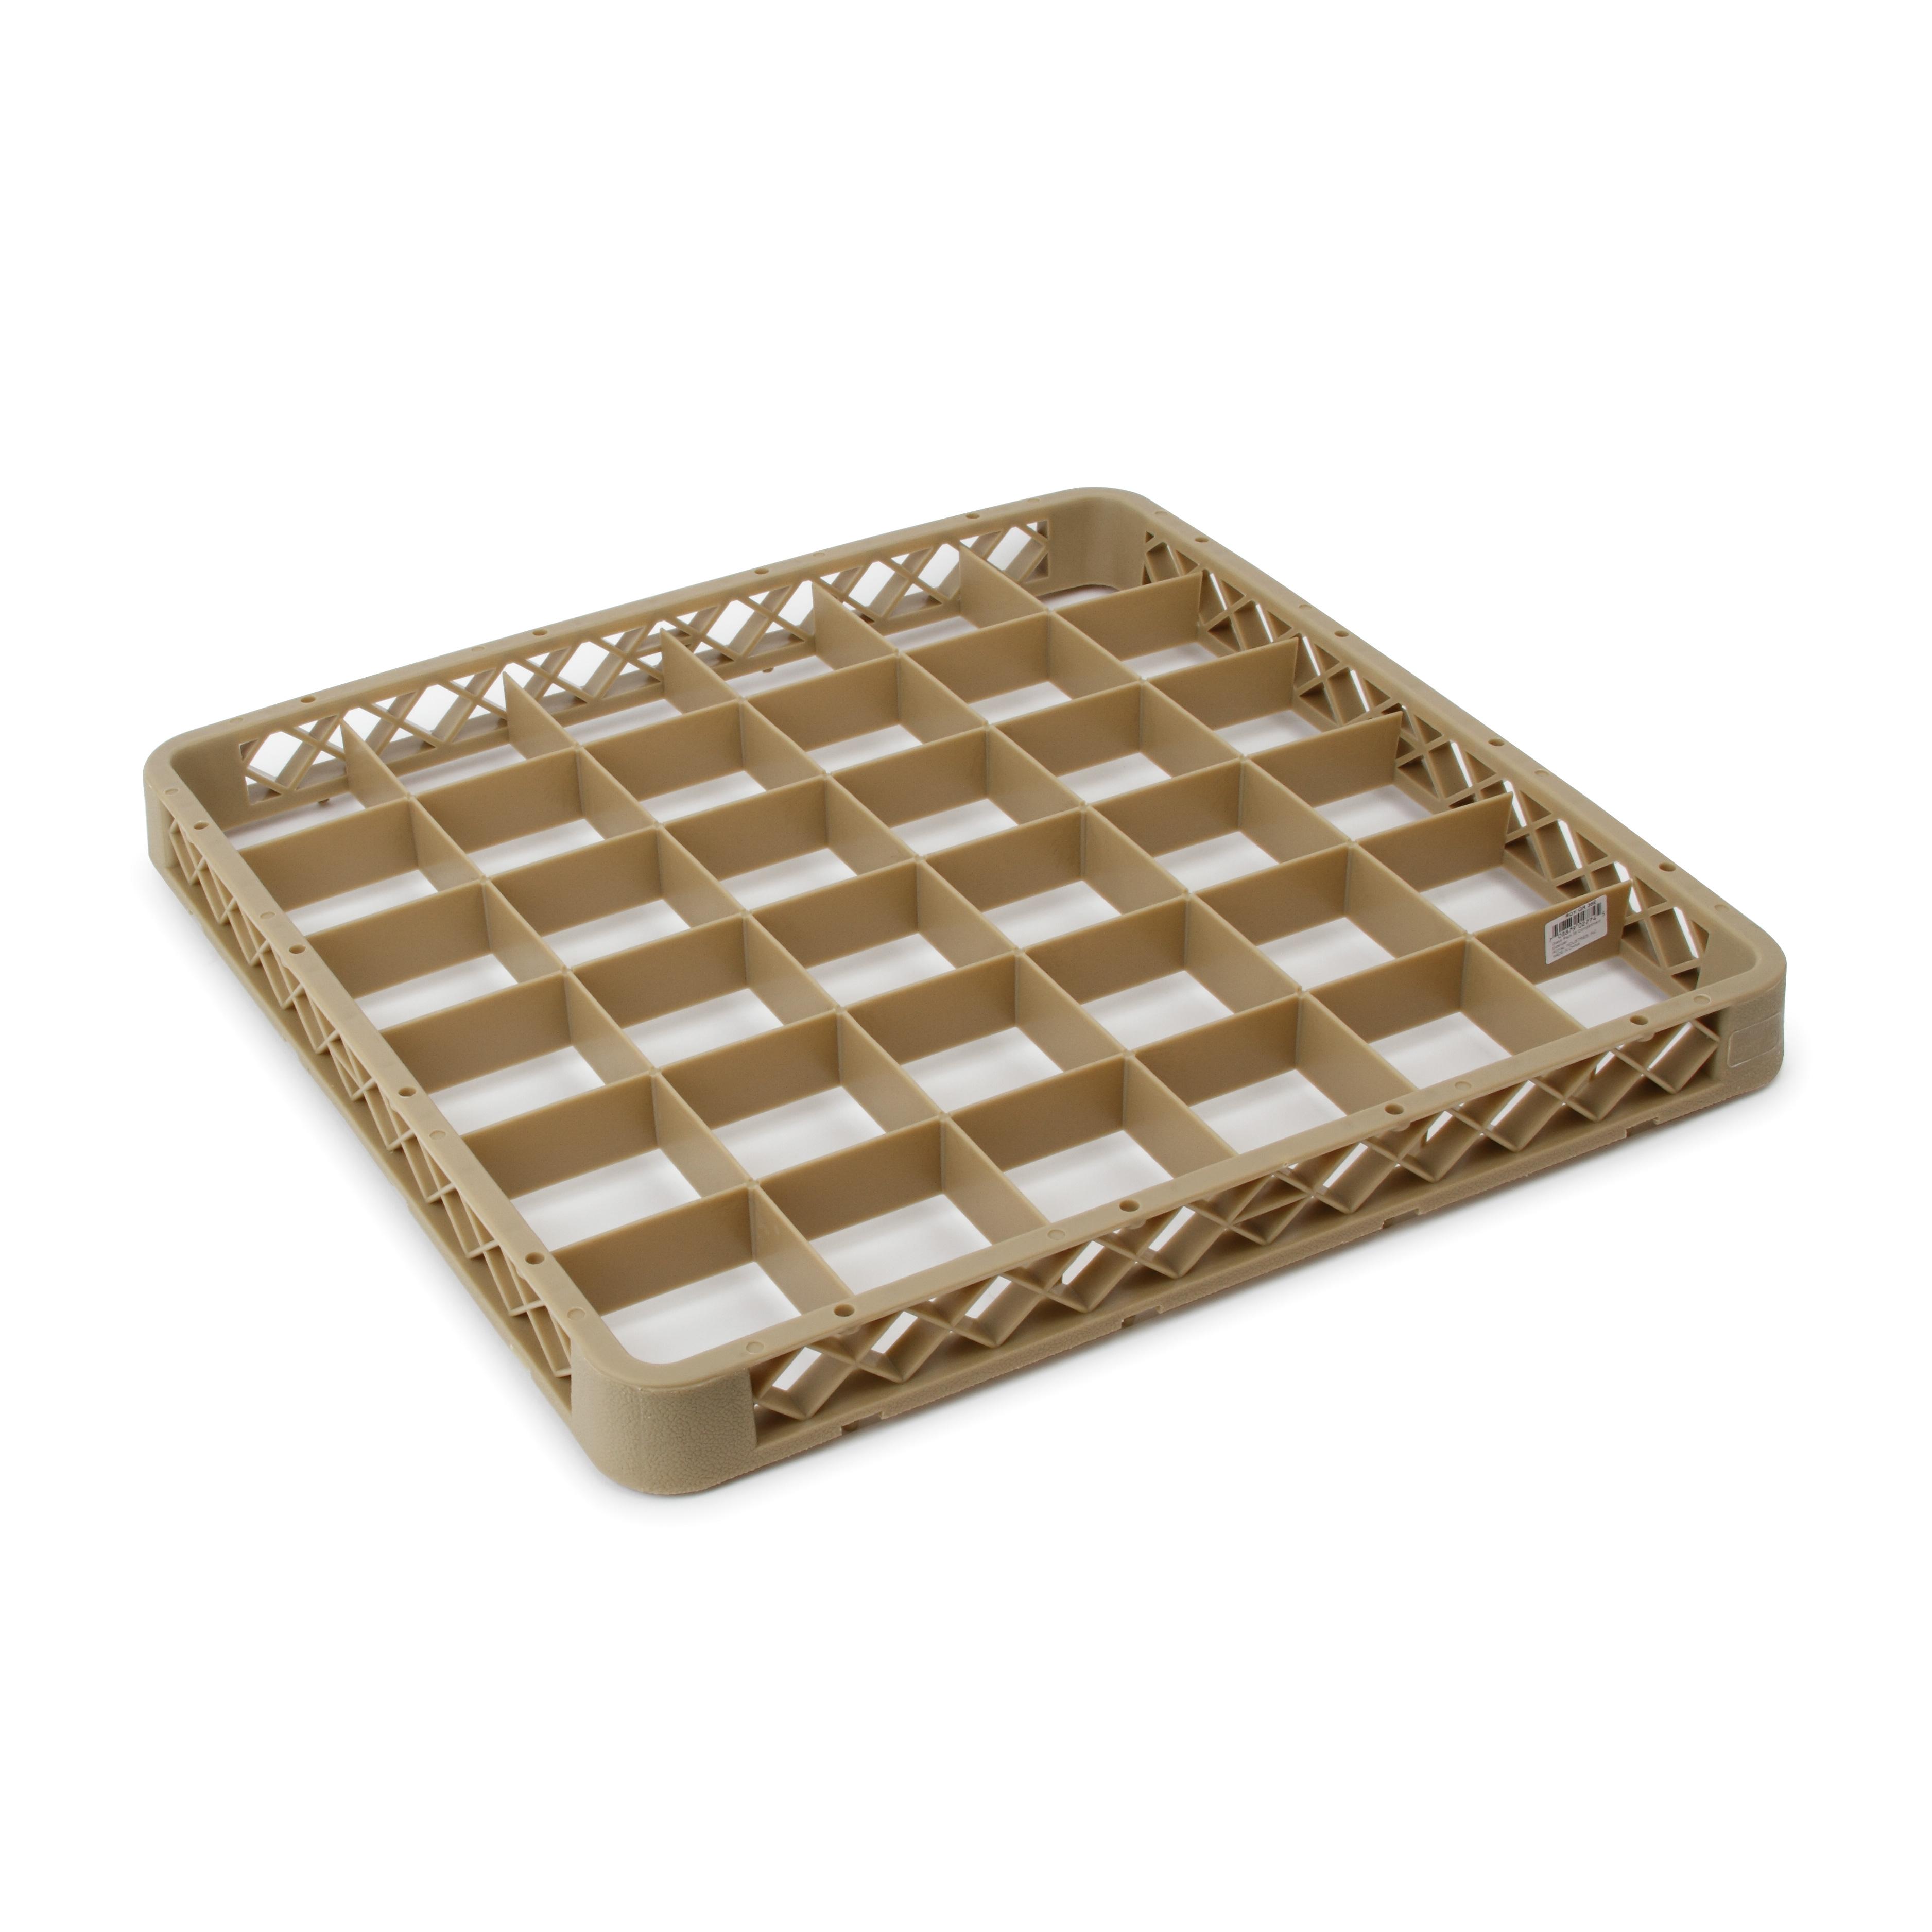 Royal Industries ROY GR 36 E dishwasher rack extender